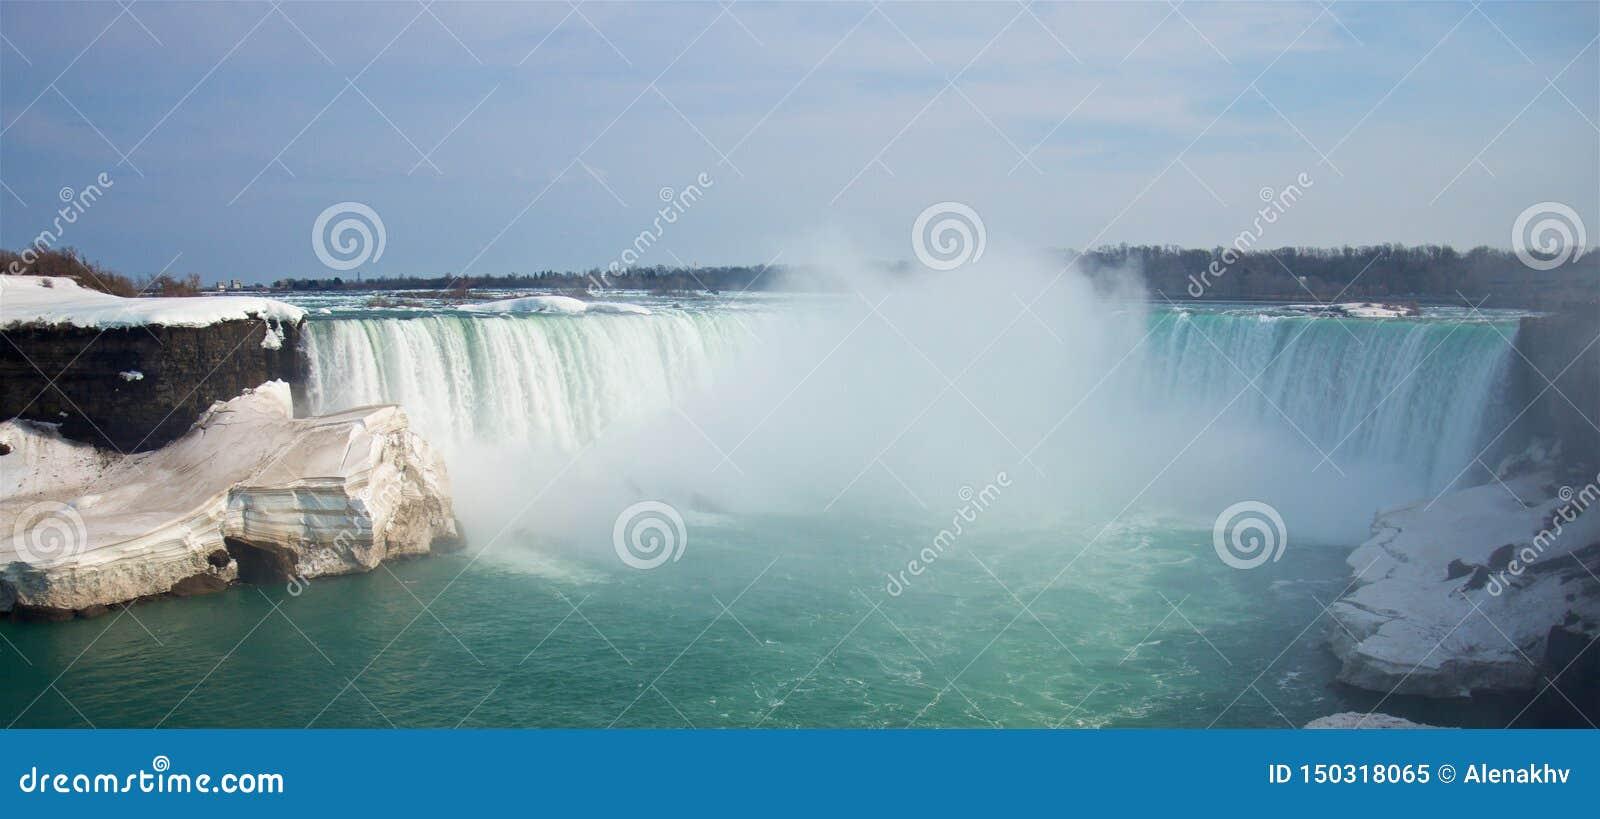 Spring panoramic view of the famous Niagara Falls Horseshoe Falls